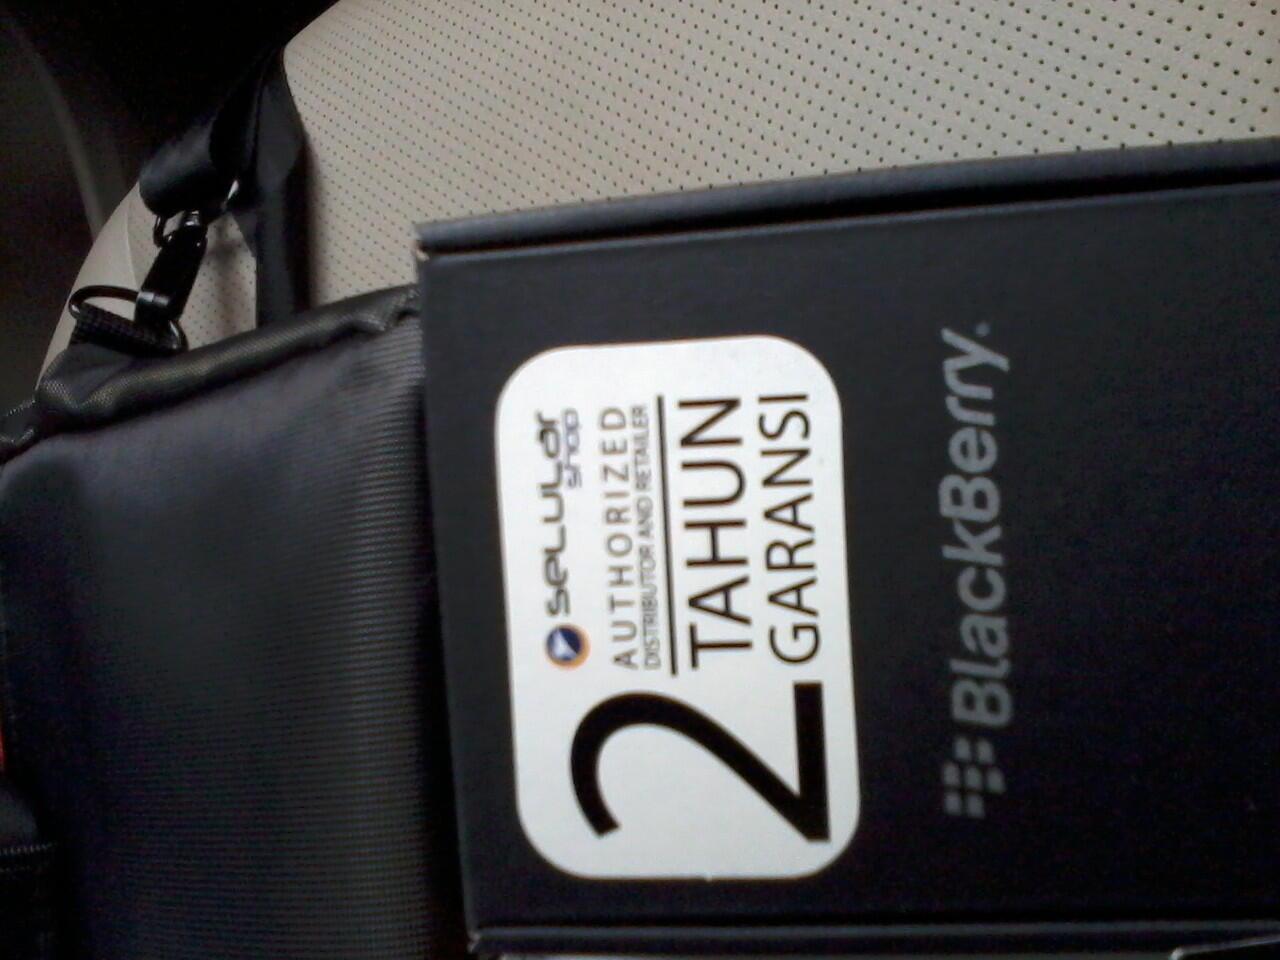 blackberry torch 2 /9810 garansi selular shop full set